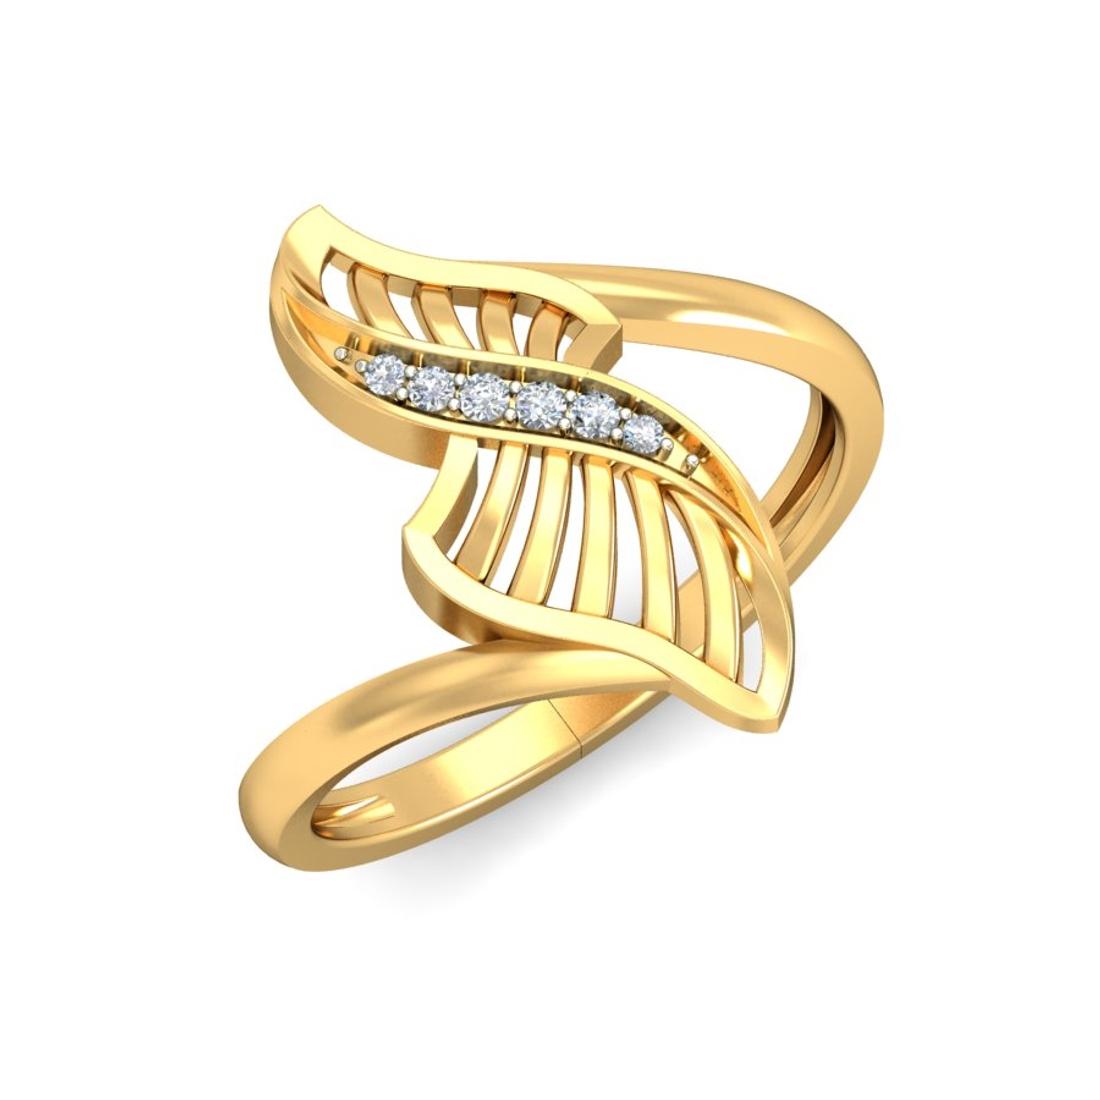 Ornomart's natural infinity Ring